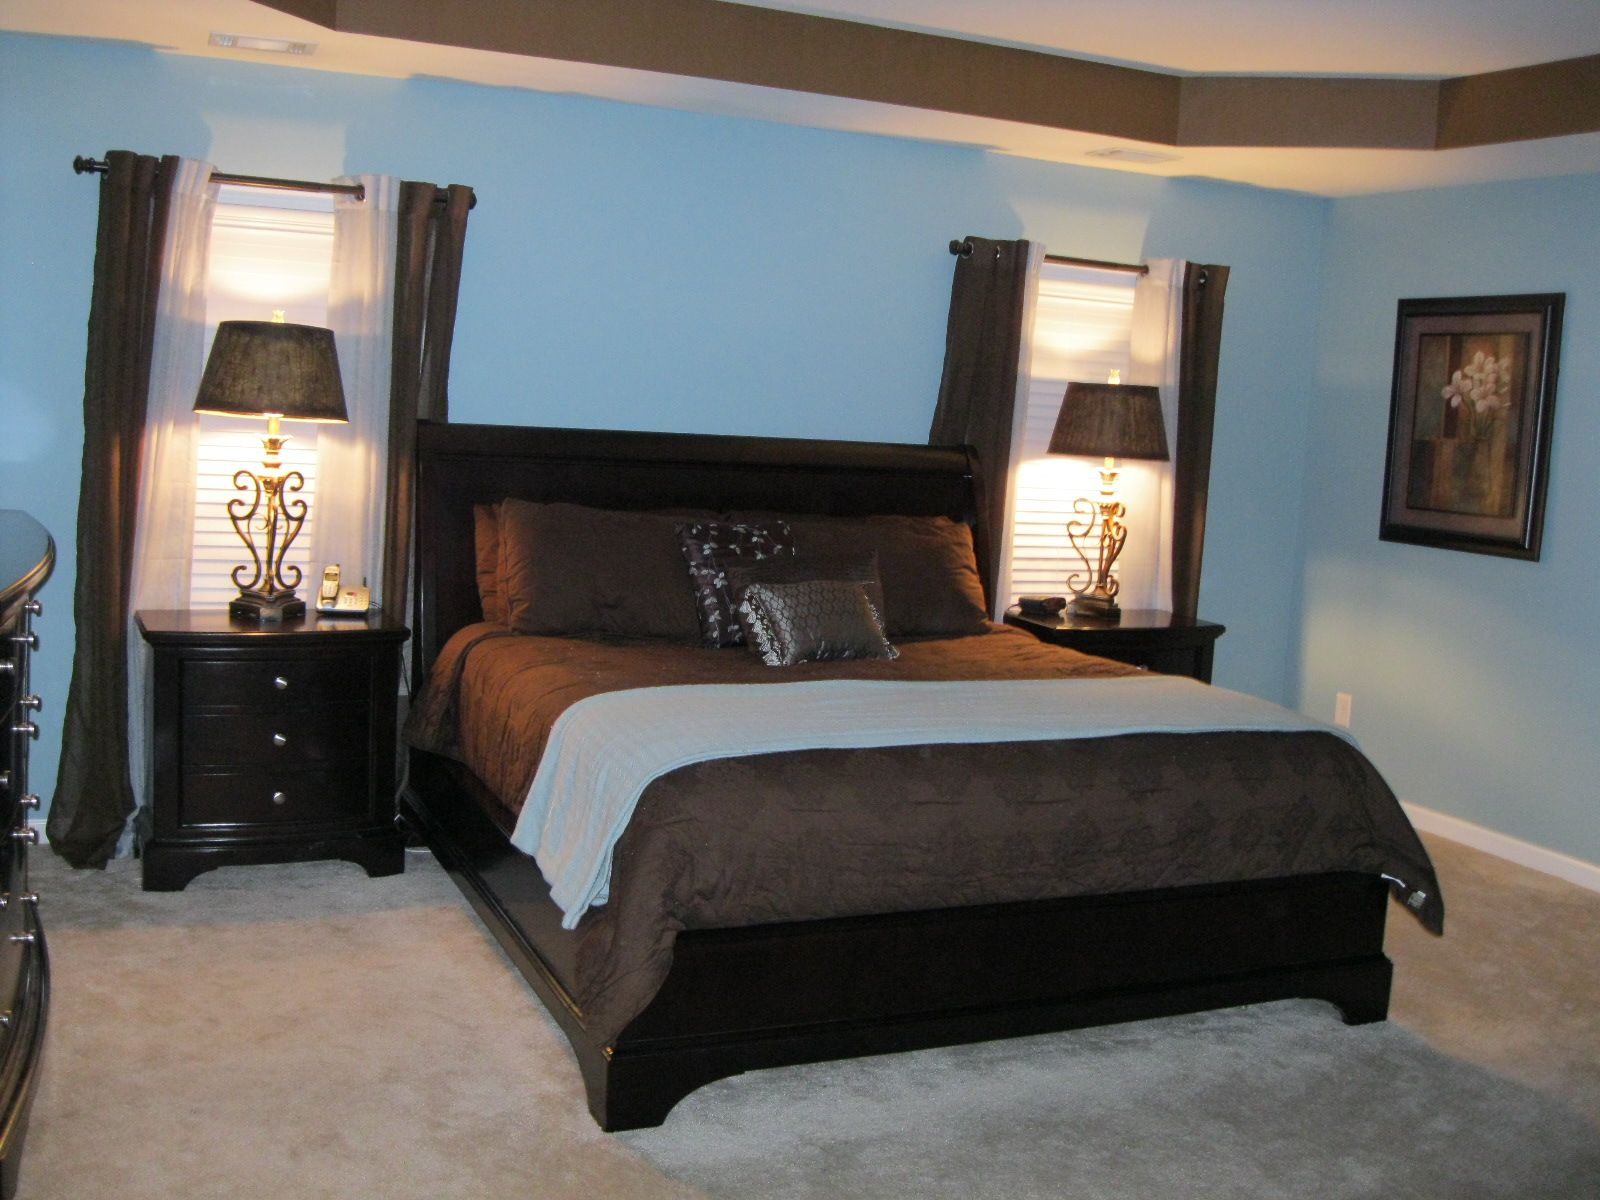 My Master Bedroom Blue Brown bo is very relaxing